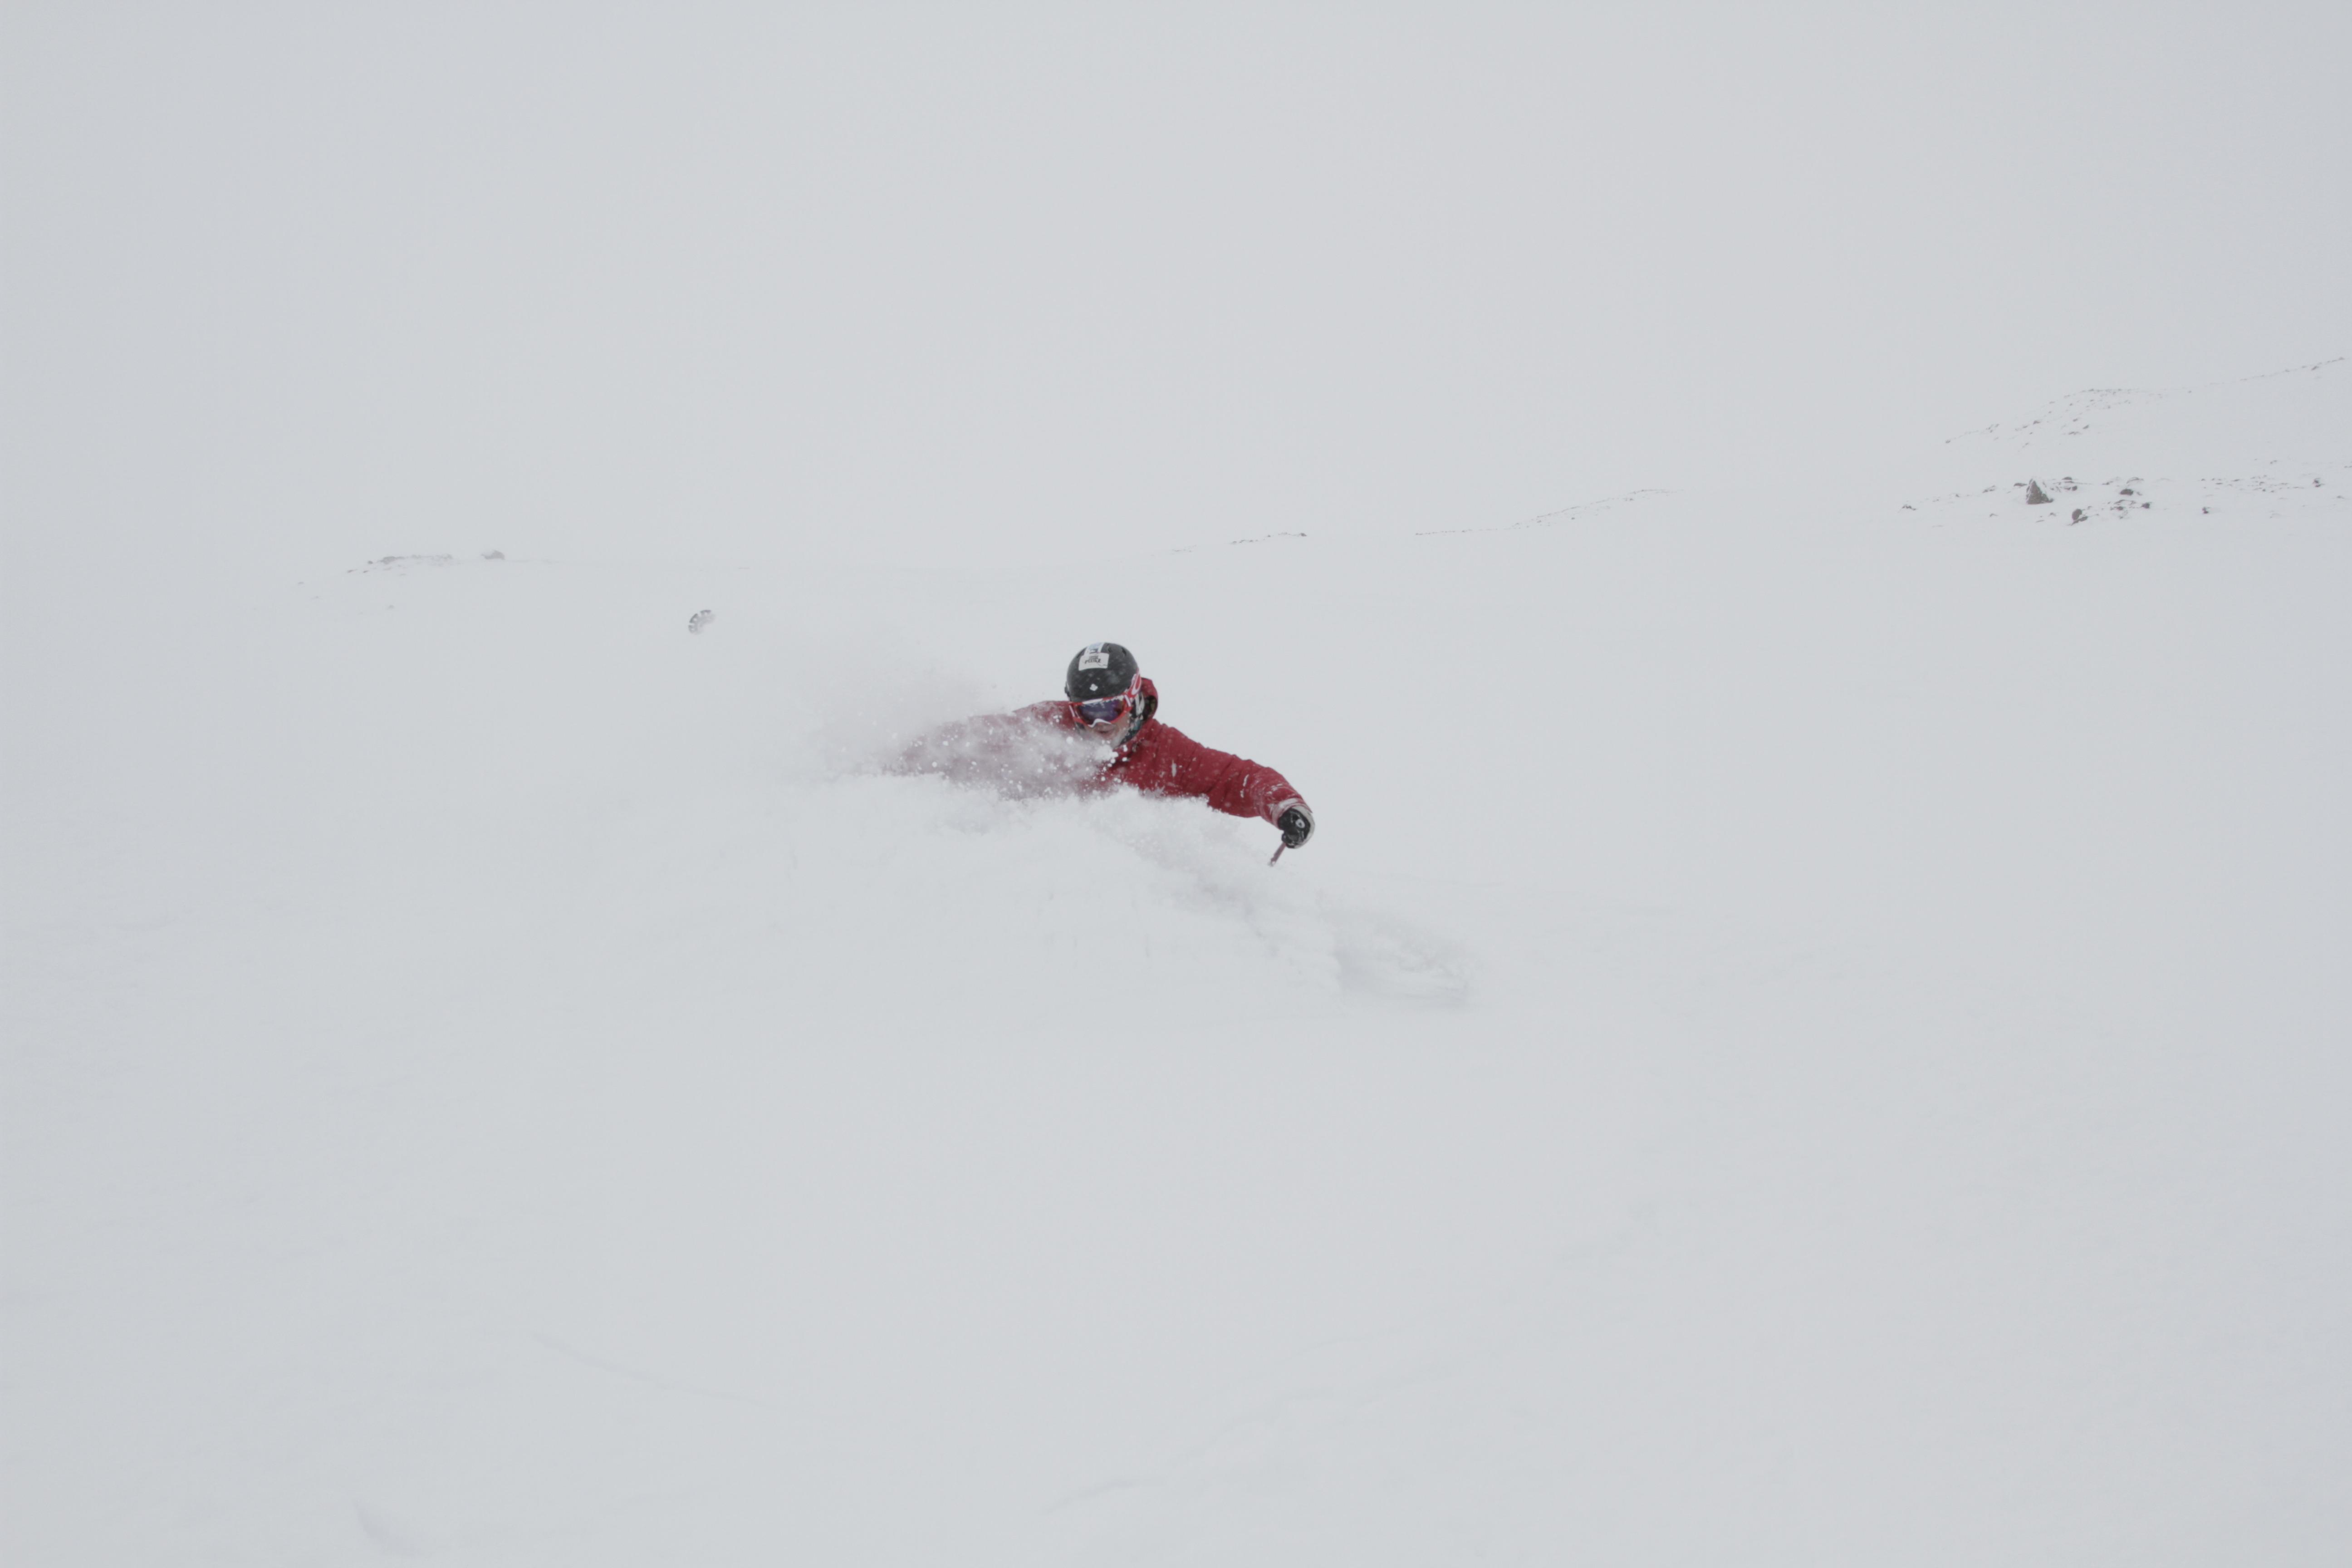 Rory Bushfield scoring Icelandic deep